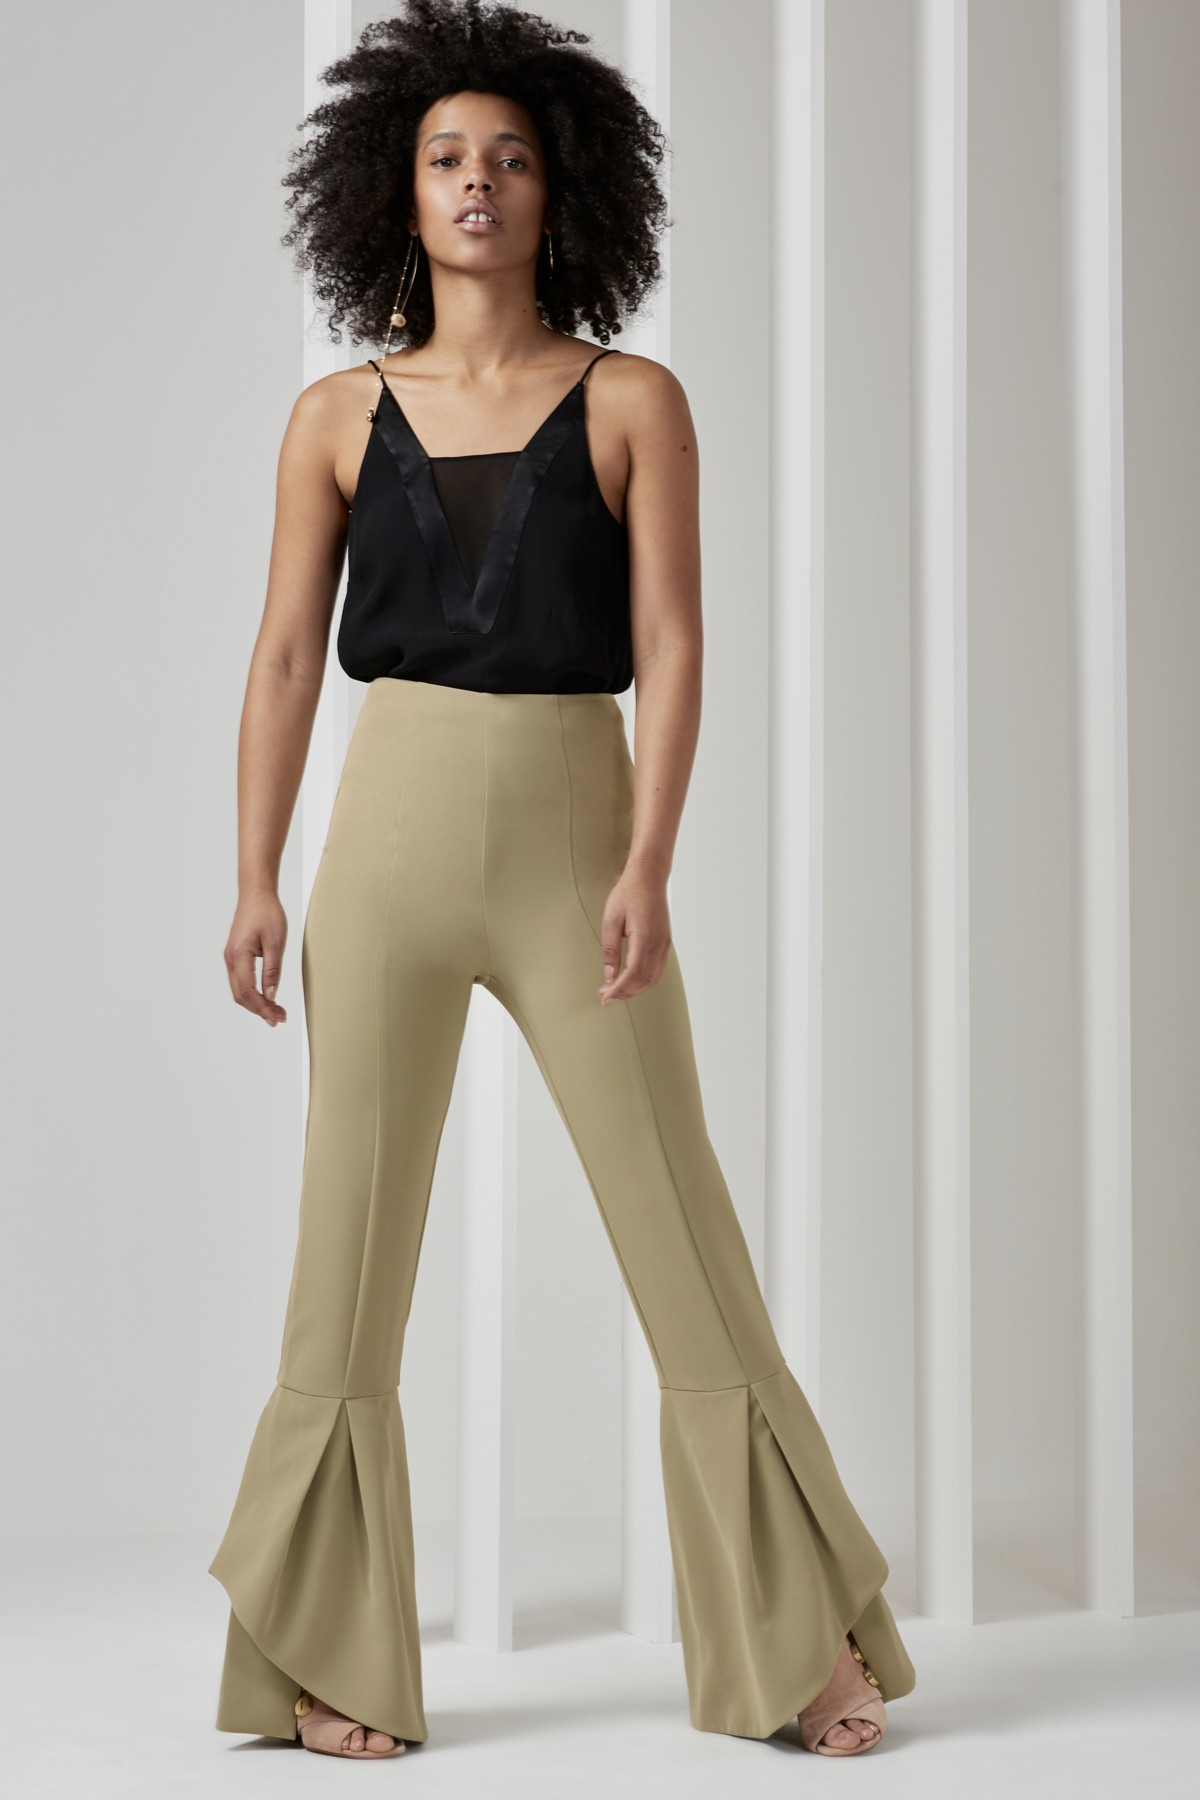 Shop  C/MEO COLLECTIVE Vivid Top  +  Enfold Pants.